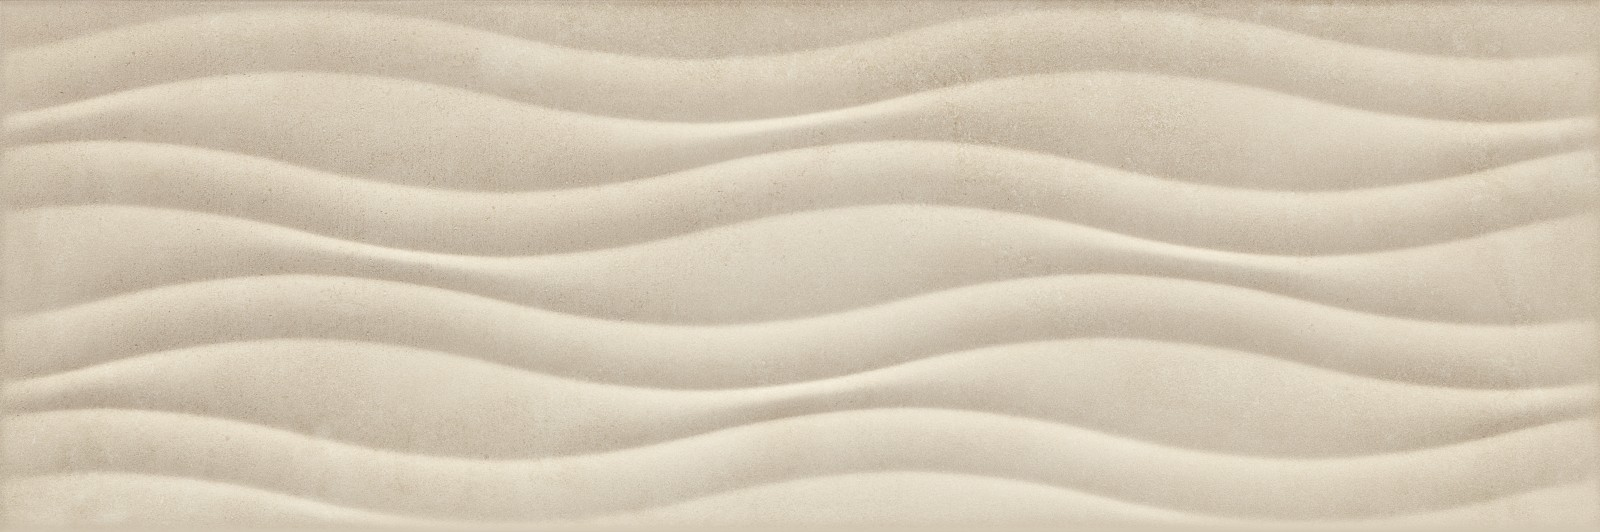 Стенни плочки Clayline Sand Struttura Share 3D 22x66.2